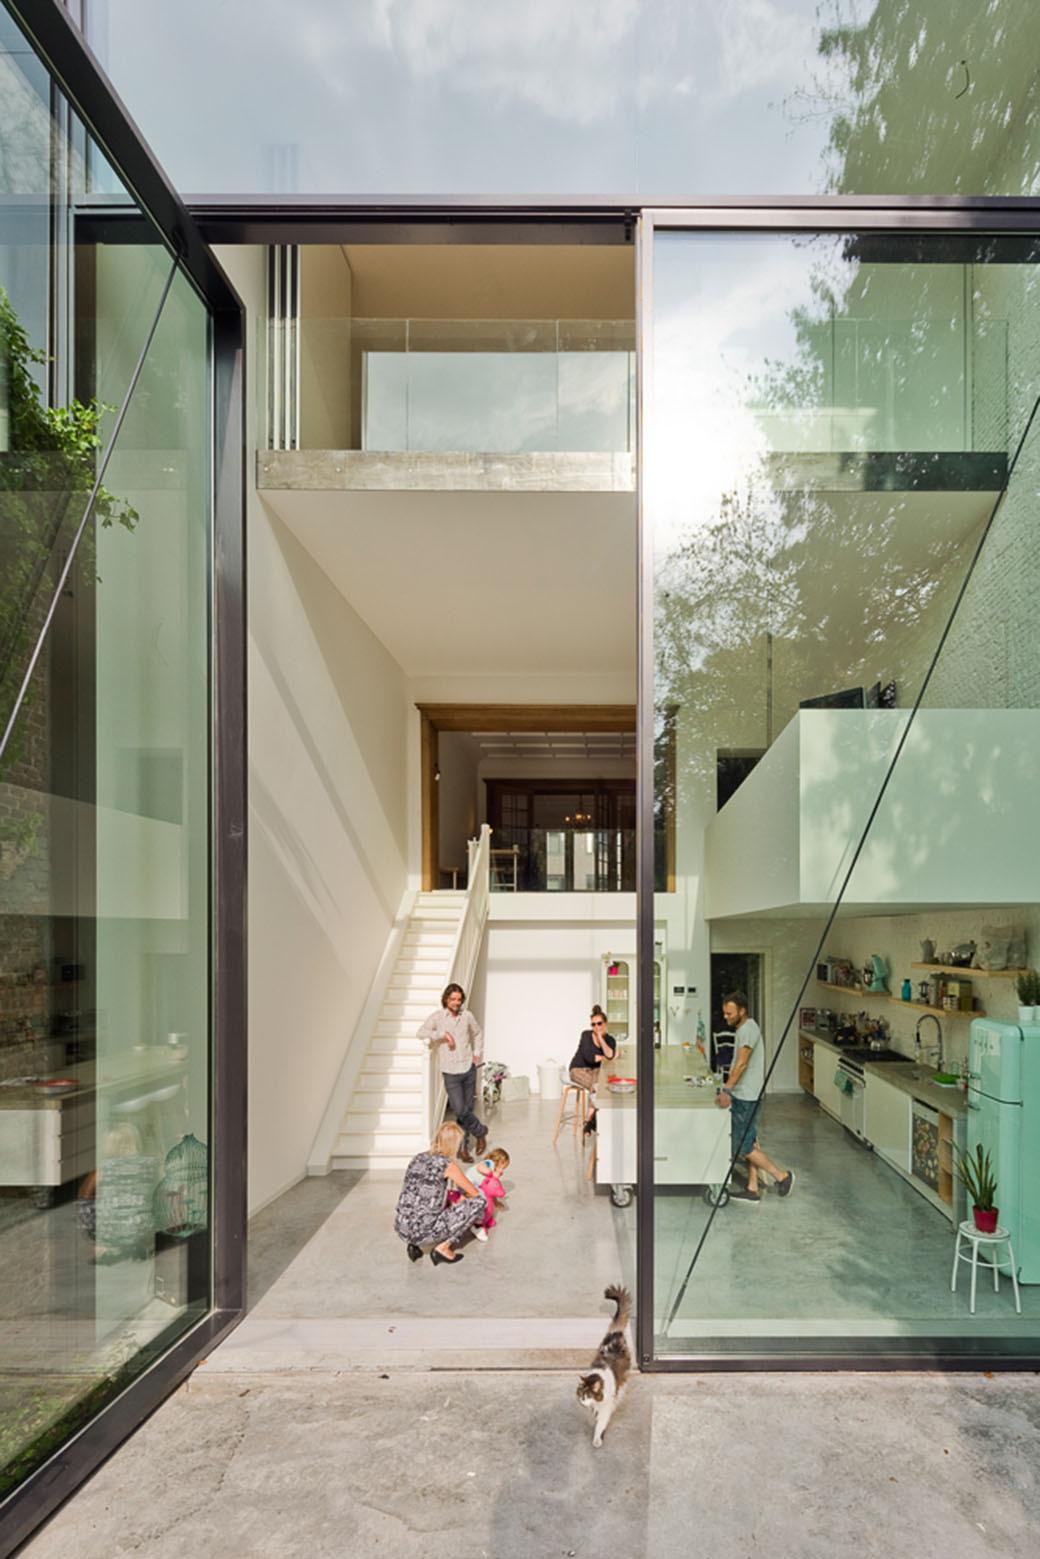 sculp(IT)-Lalo-architecture